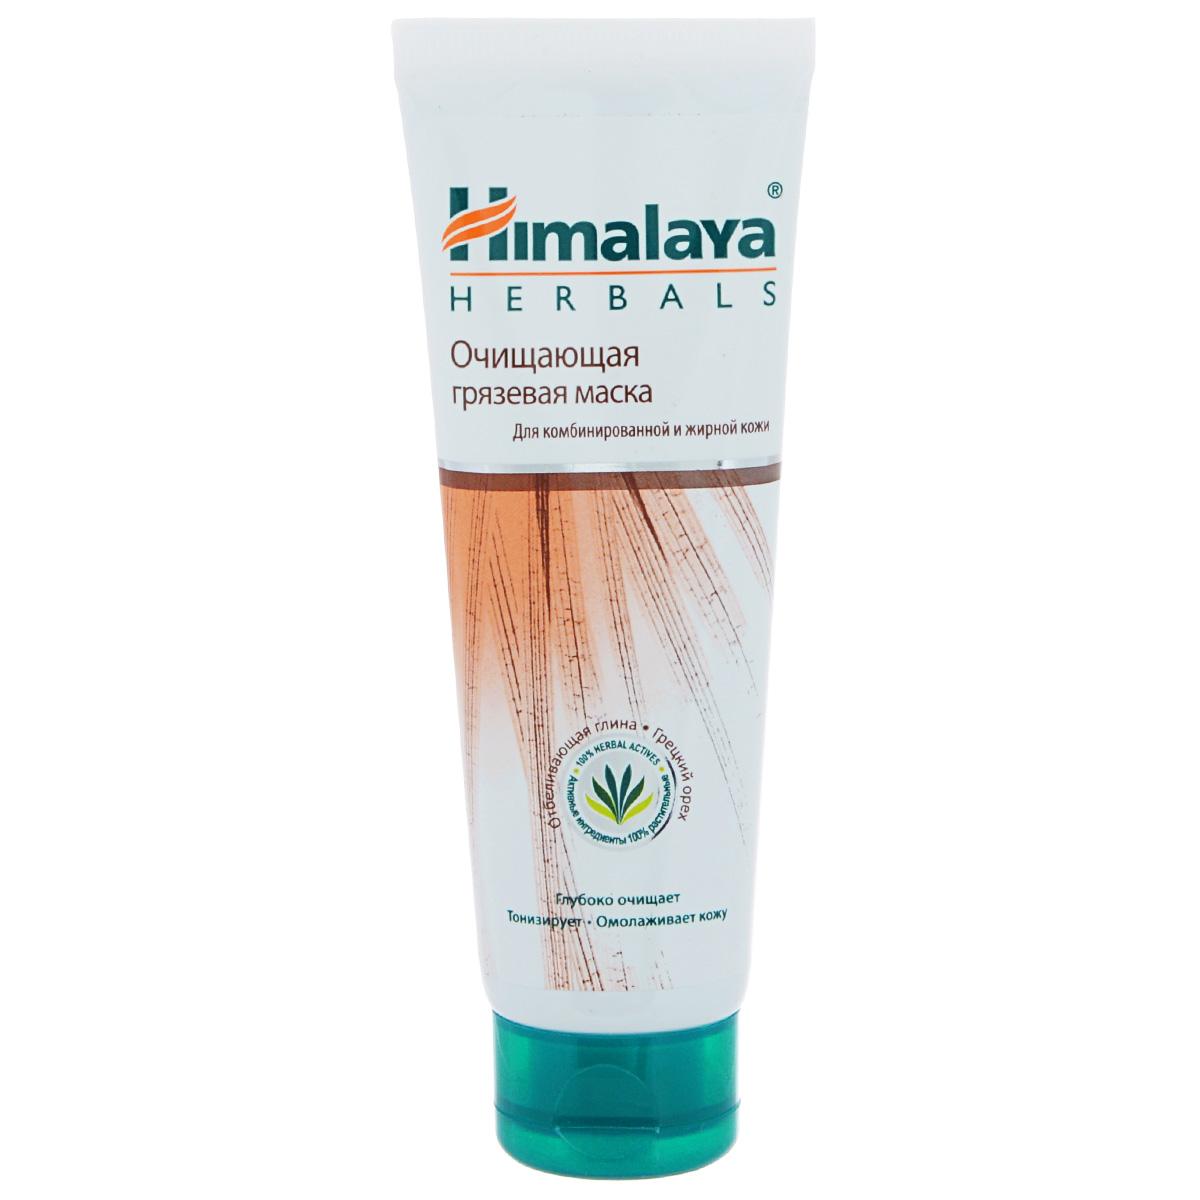 Himalaya Herbals Очищающая грязевая маска, 75мл